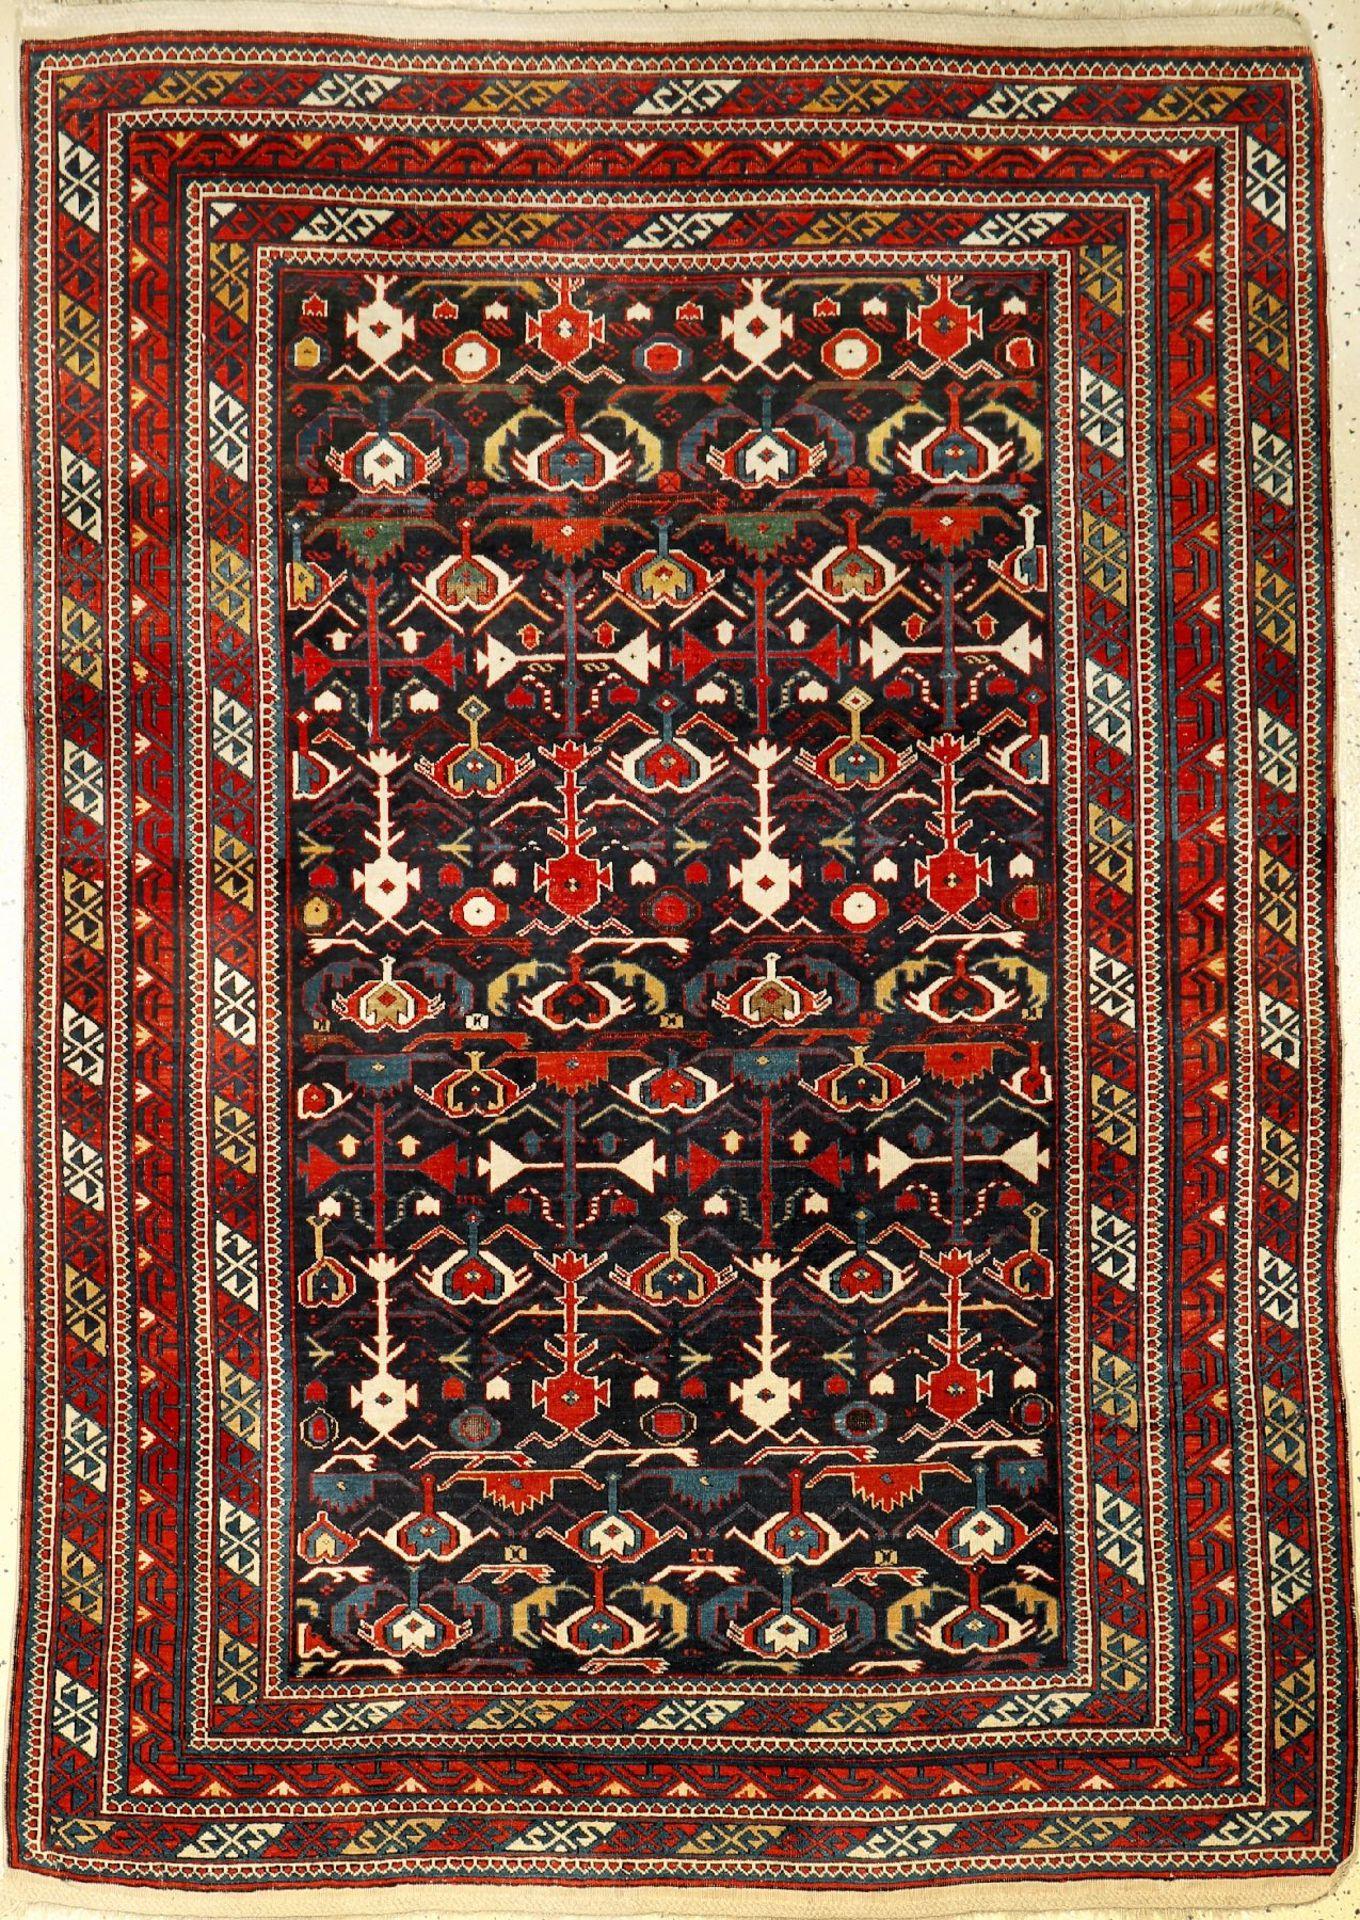 Kuba Shirvan antique, Caucasus, 19th century, wool on wool, approx. 183 x 127 cm, rarity, condition: